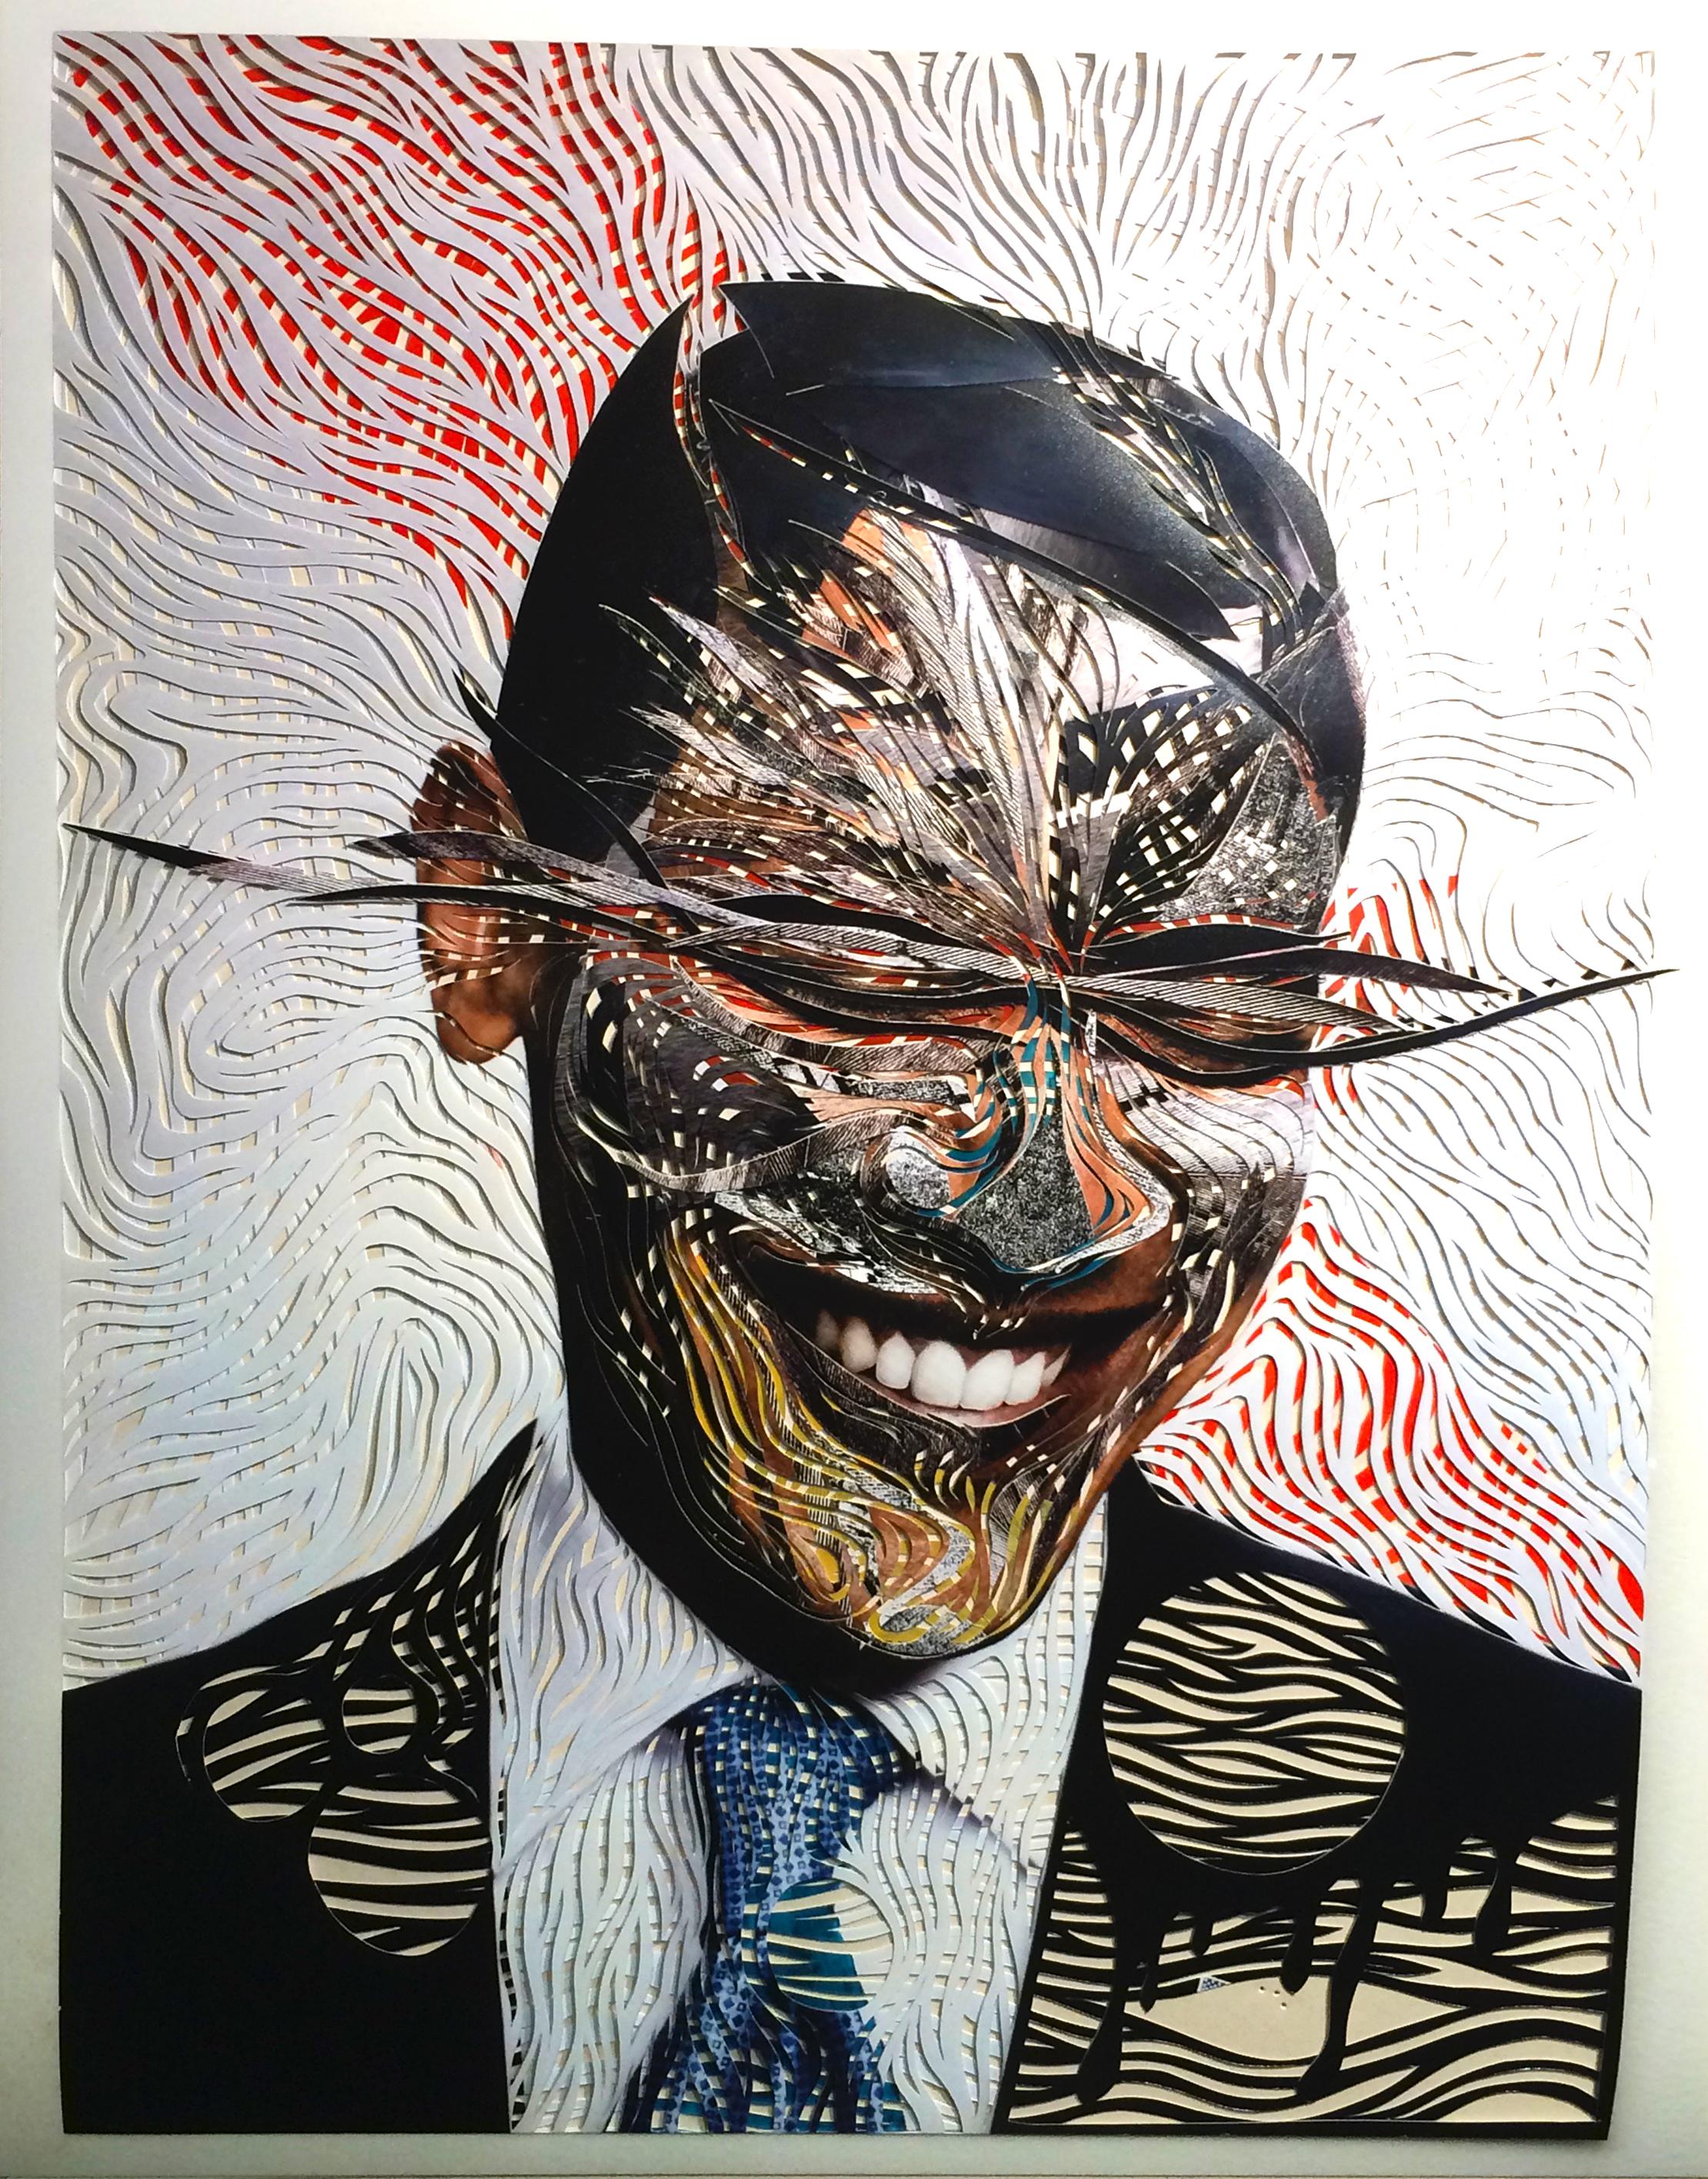 Marco Gallotta, Barack Obama